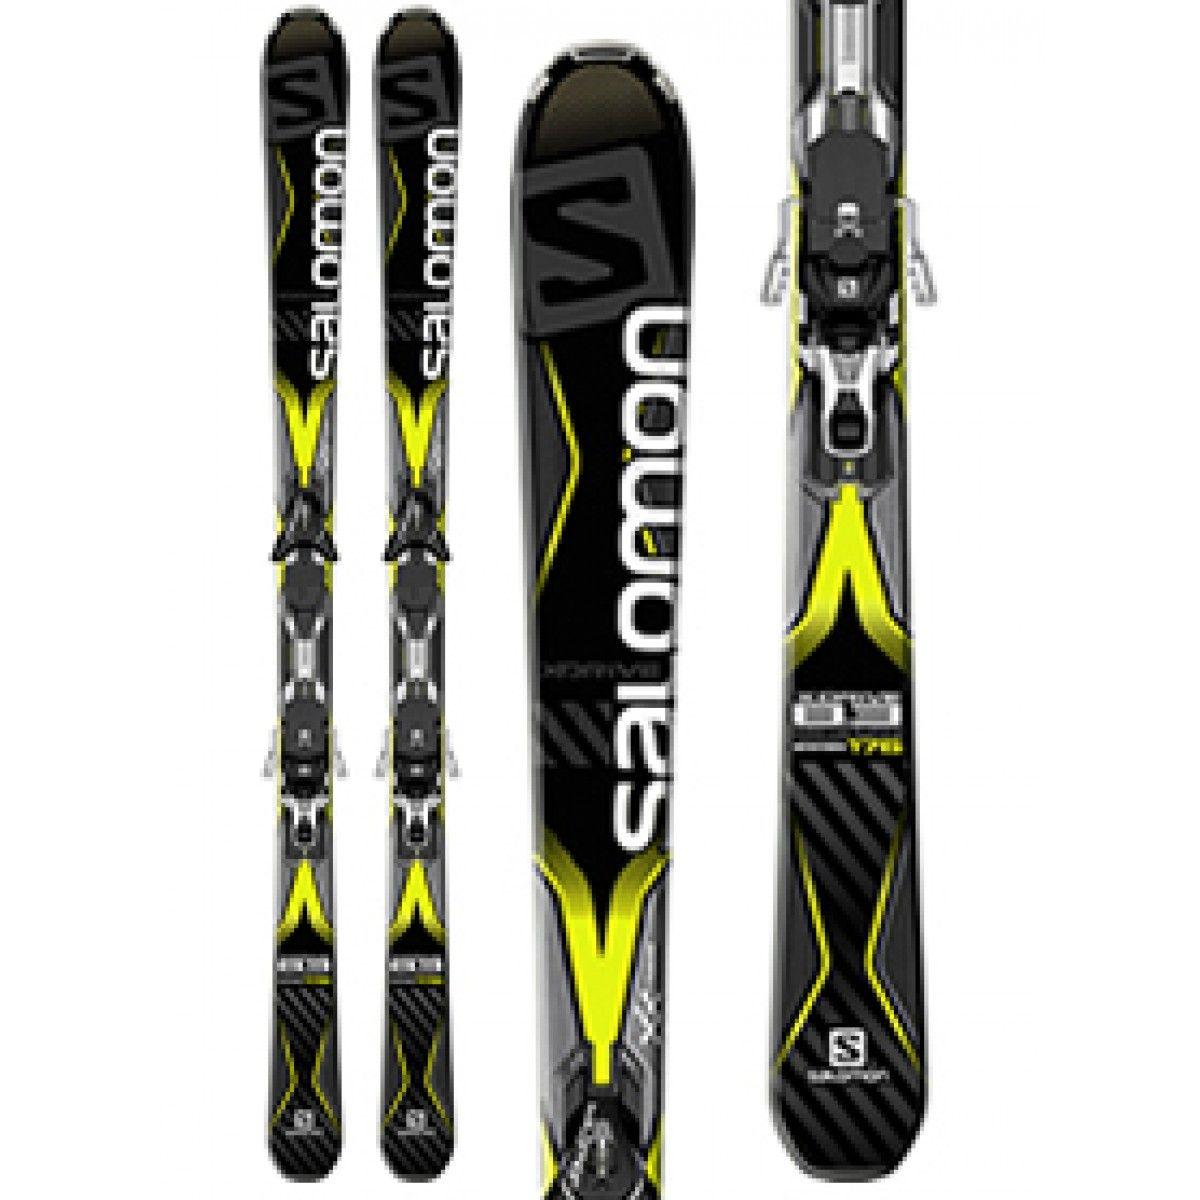 Salomon X Drive 8 3 Skis With Mxt12 Binding 15 16 Golf Ski Warehouse Skiing Salomon Mens Skis